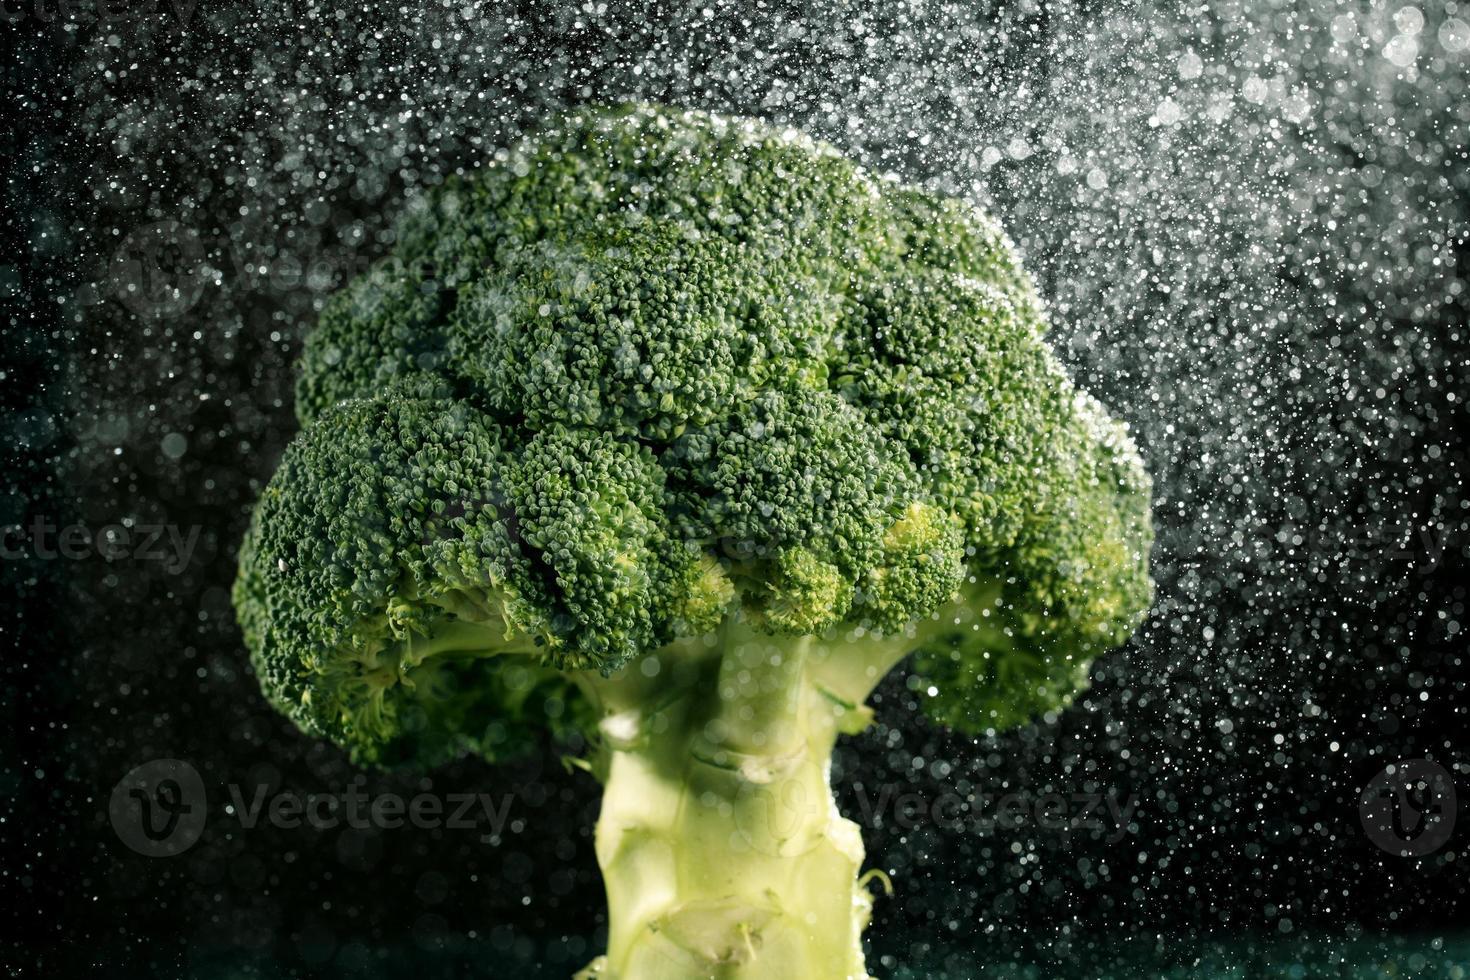 broccoli on black background photo